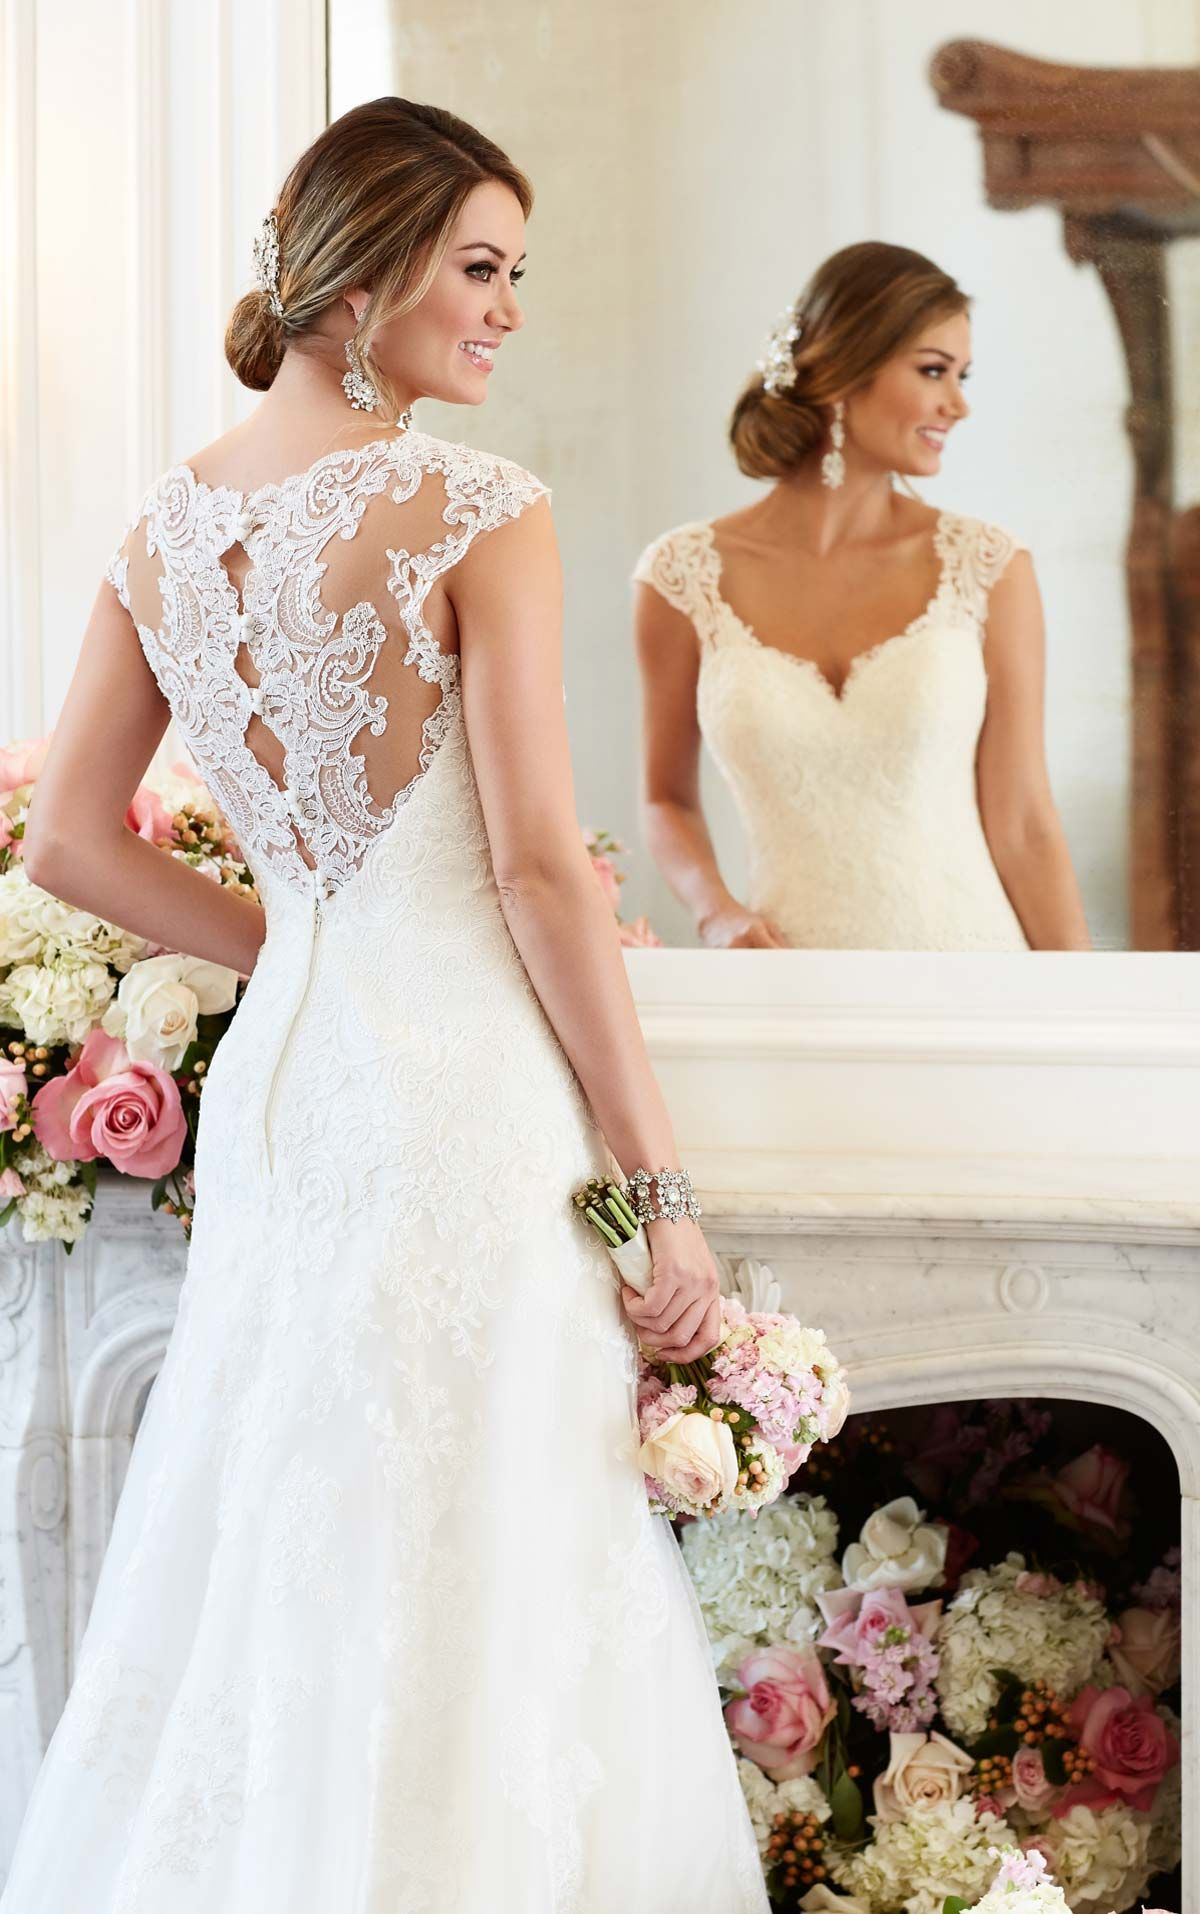 Lace cap sleeve a line wedding dress  ALine Sweetheart Wedding Dress  Stella york Illusions and Romantic